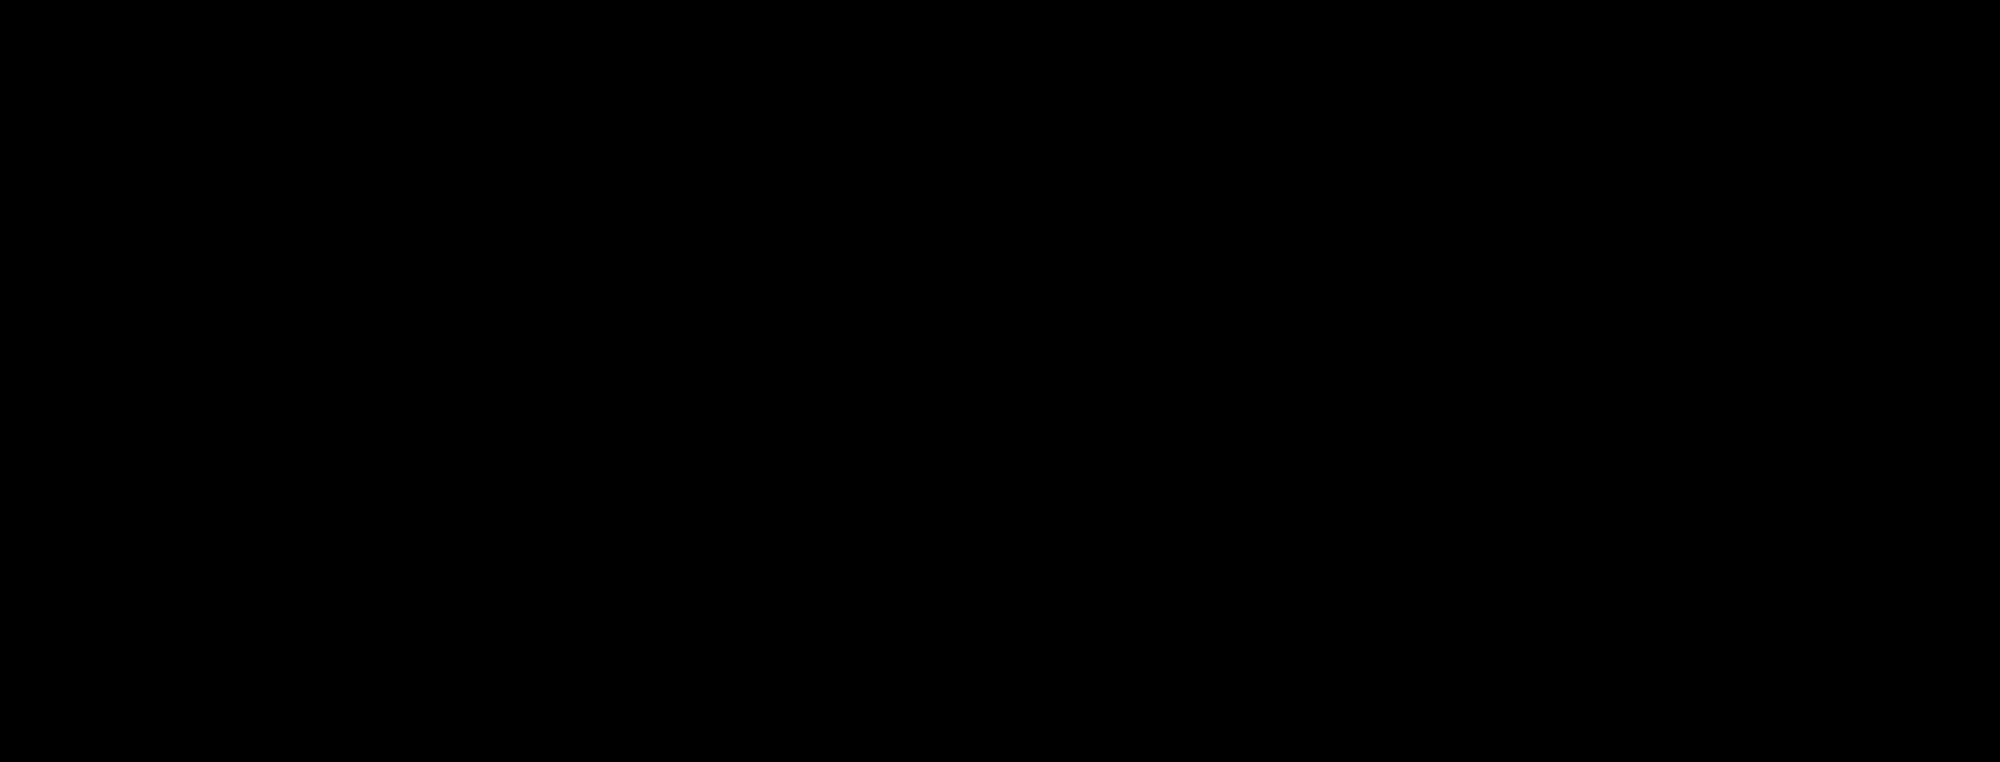 Shoaf-Archie Law, PLLC-logo-black.png